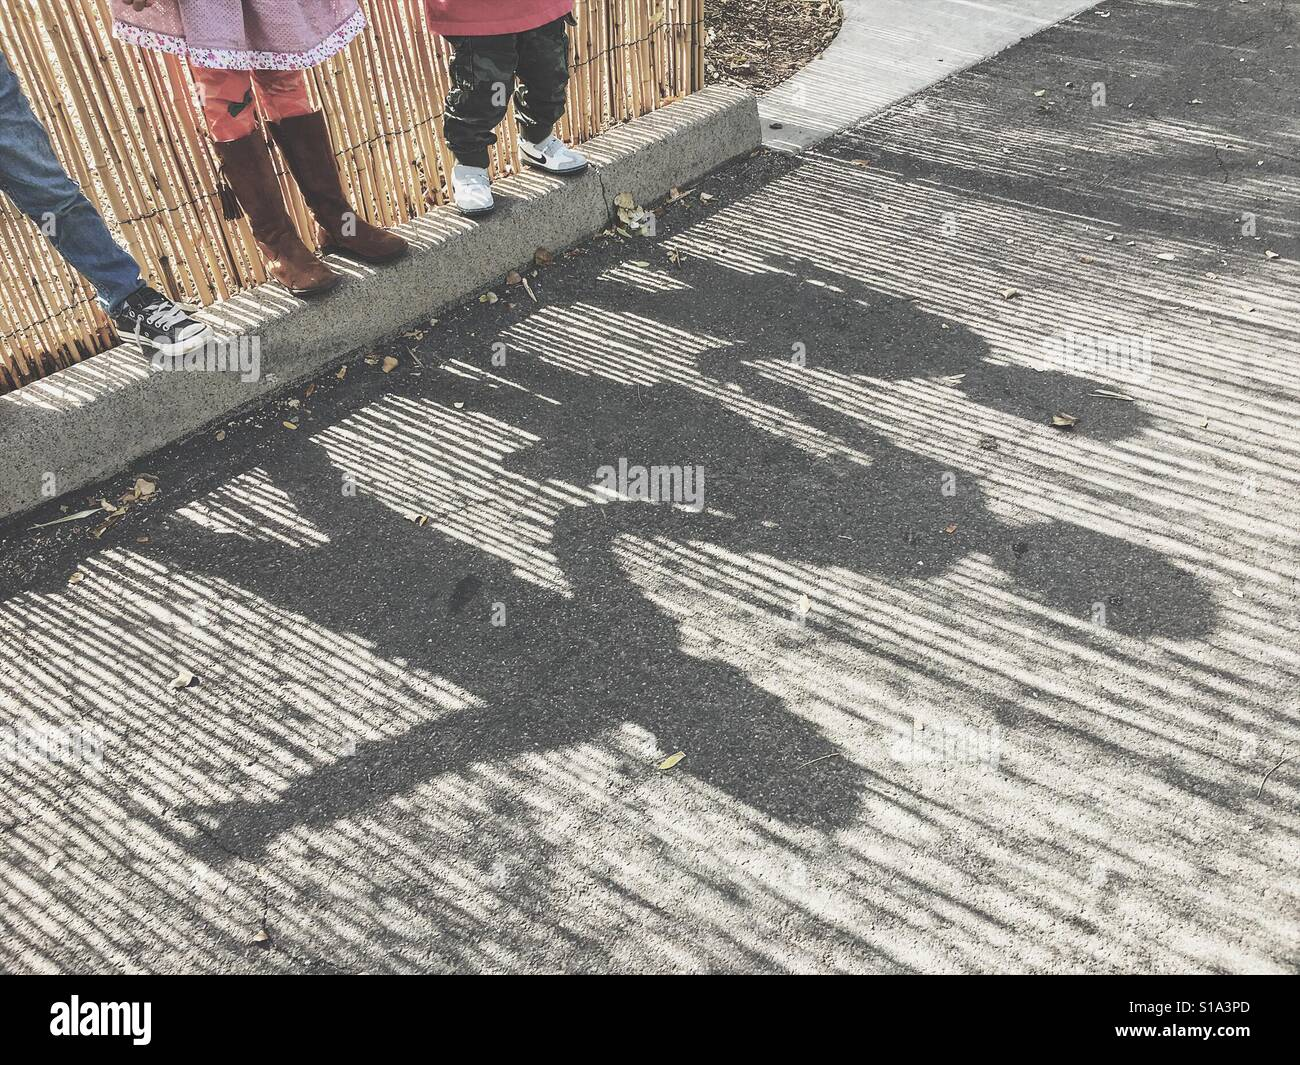 Bambino immaginazioneFoto Stock